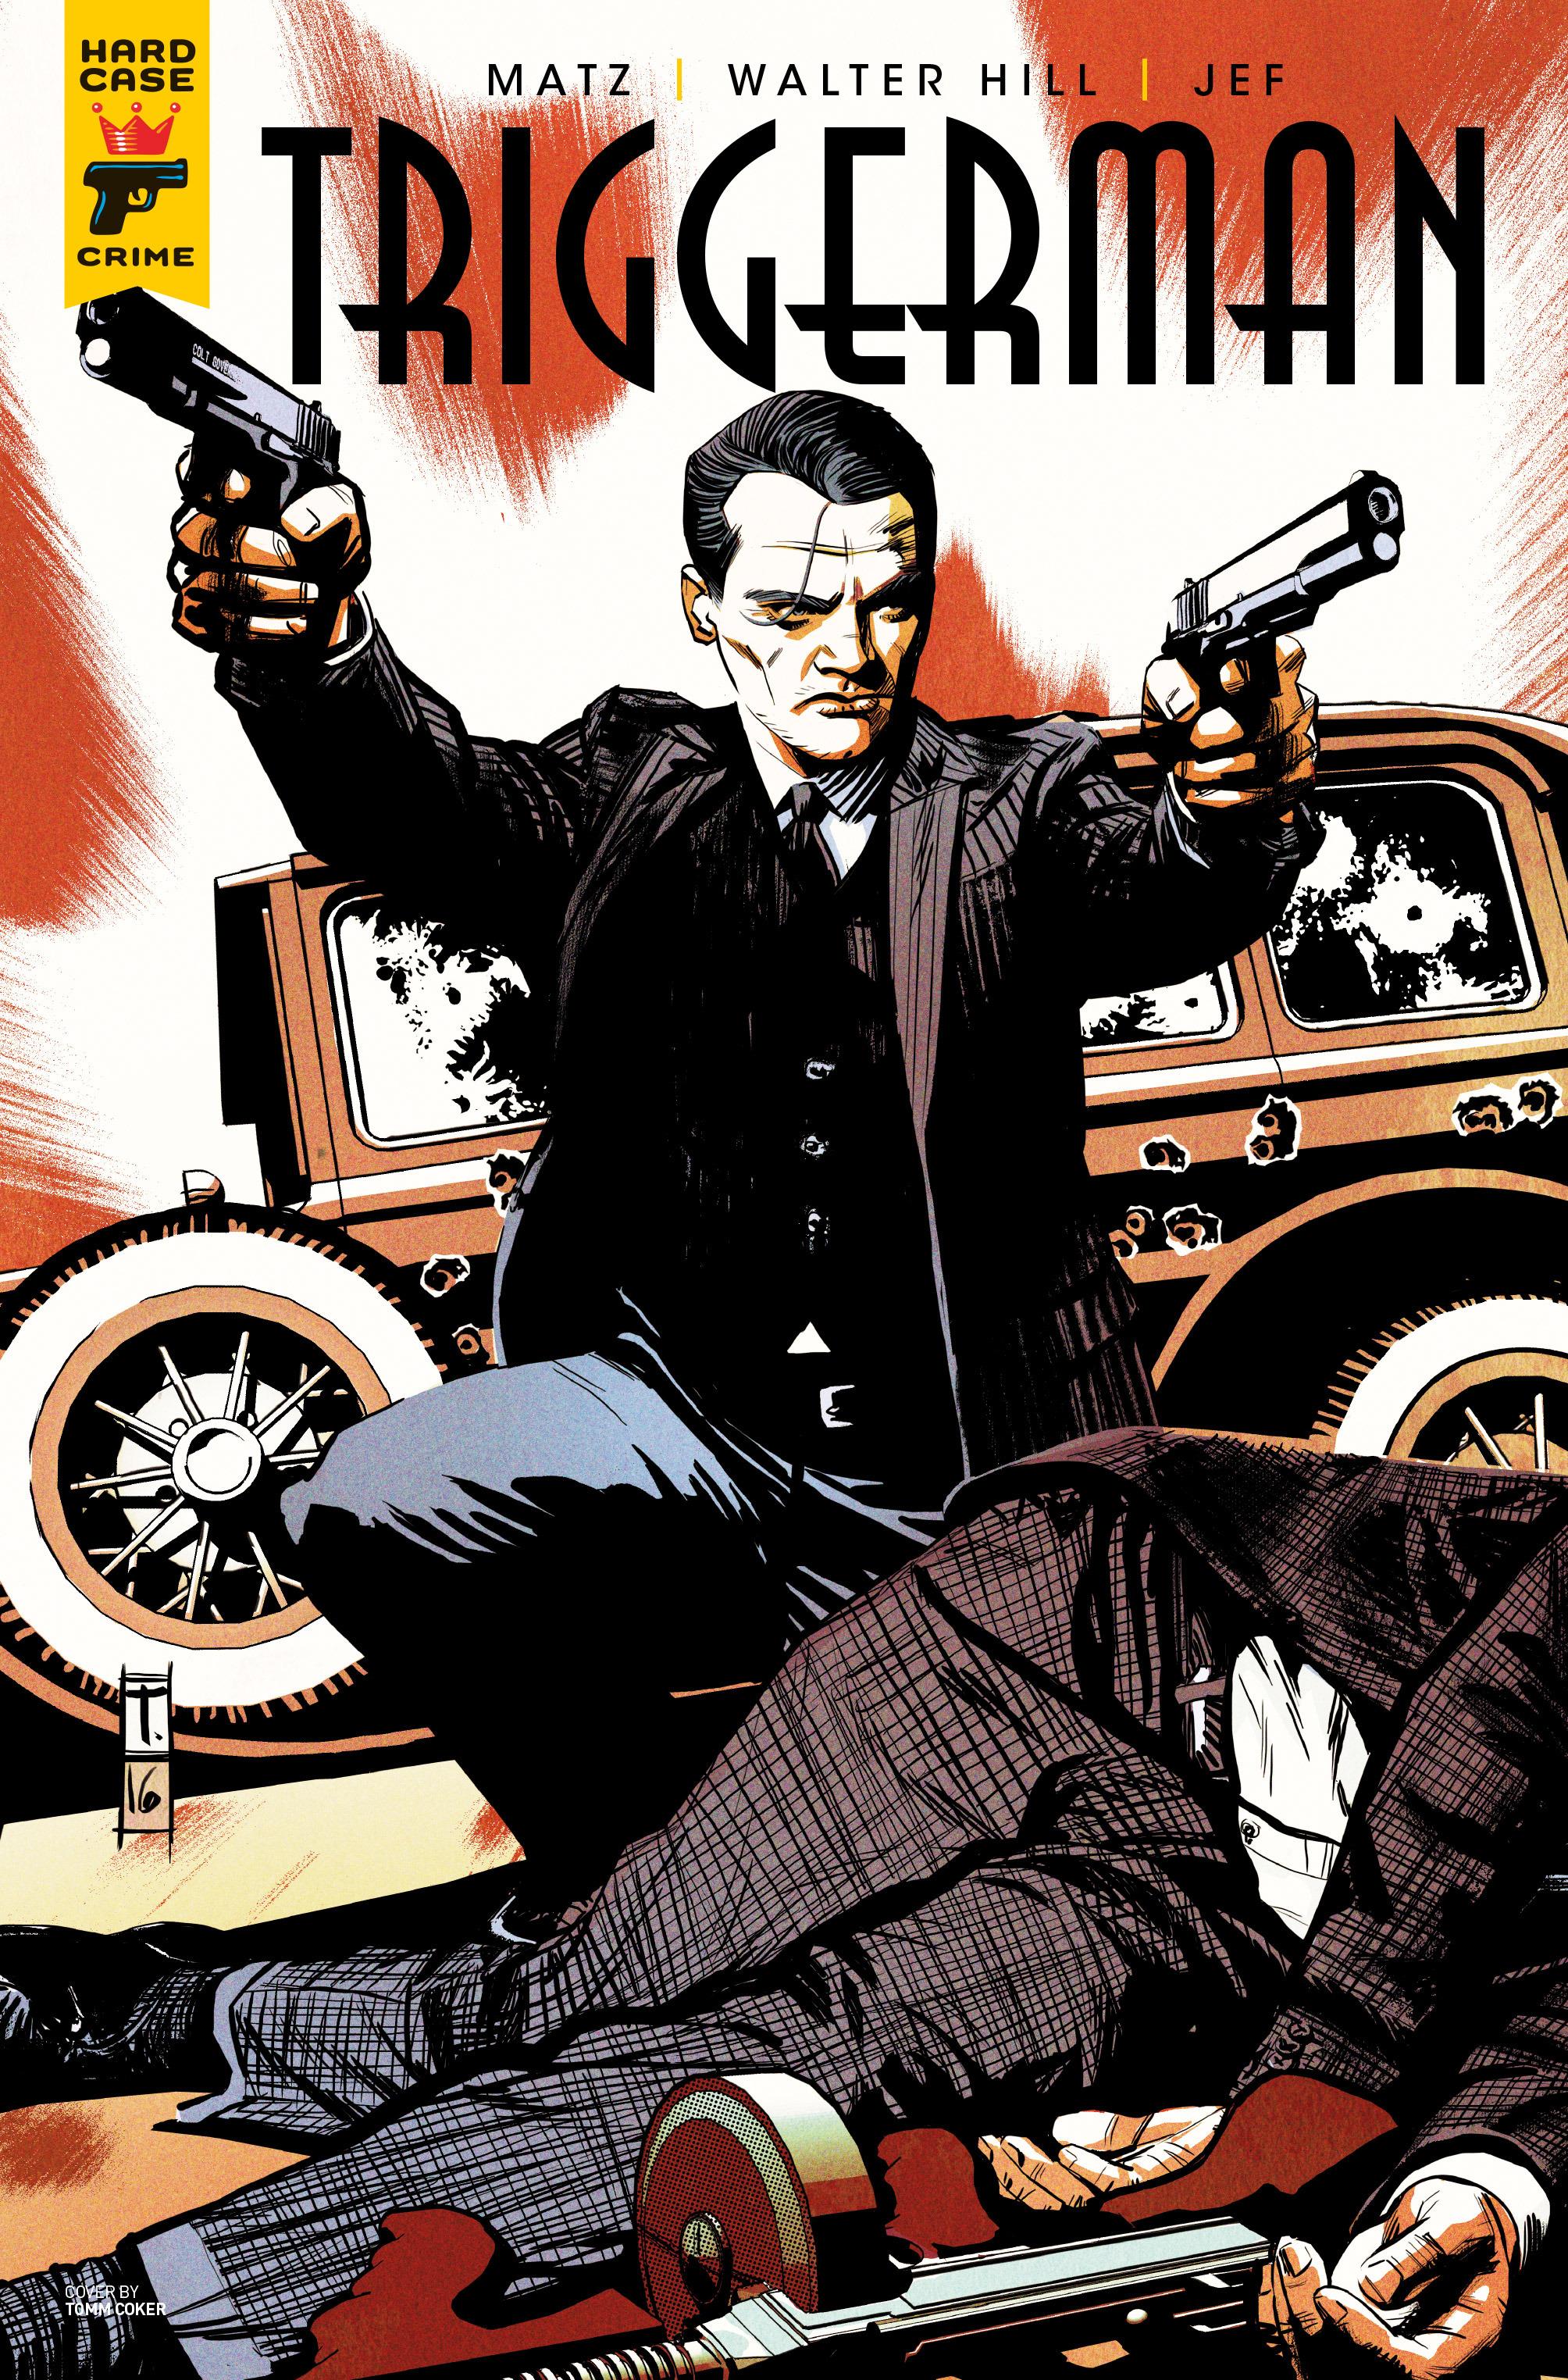 Read online Triggerman comic -  Issue #5 - 1